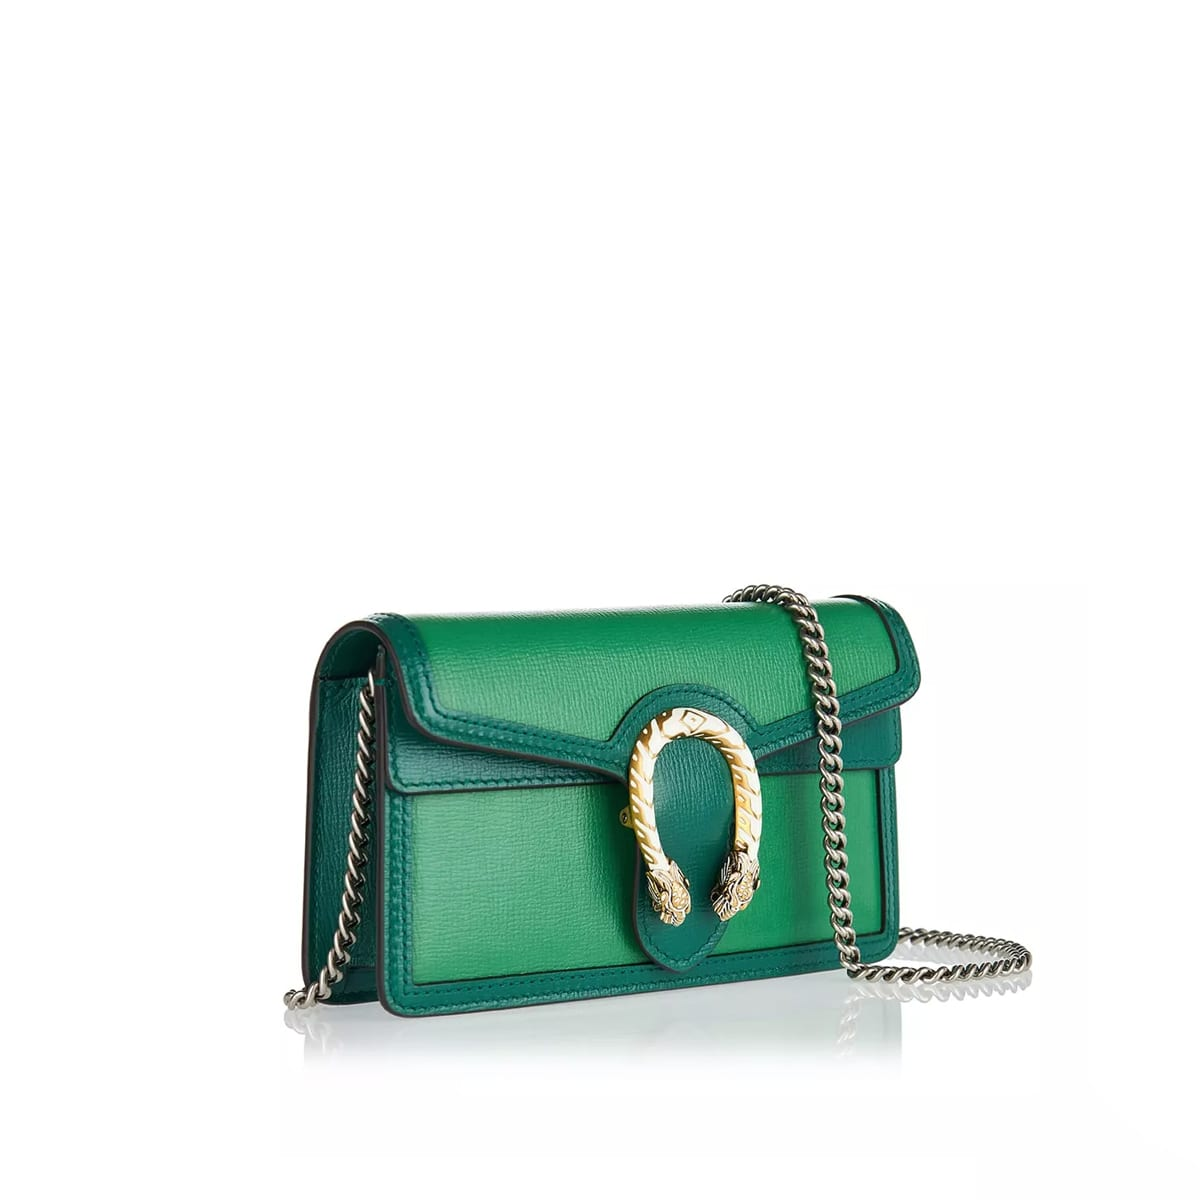 Dionysus Super Mini leather shoulder bag